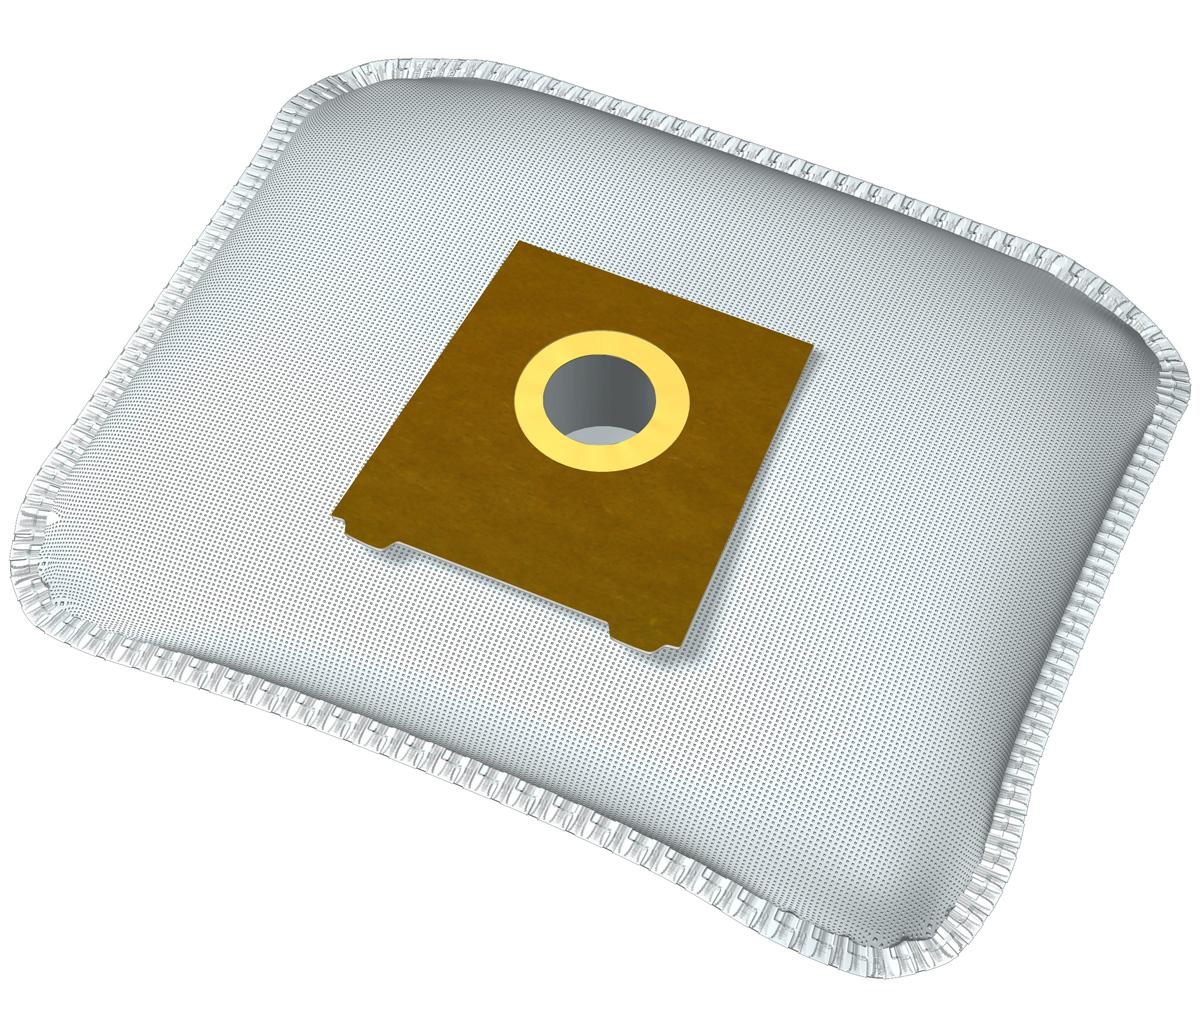 20 staubsaugerbeutel f r siemens super l electronic 910 ebay. Black Bedroom Furniture Sets. Home Design Ideas